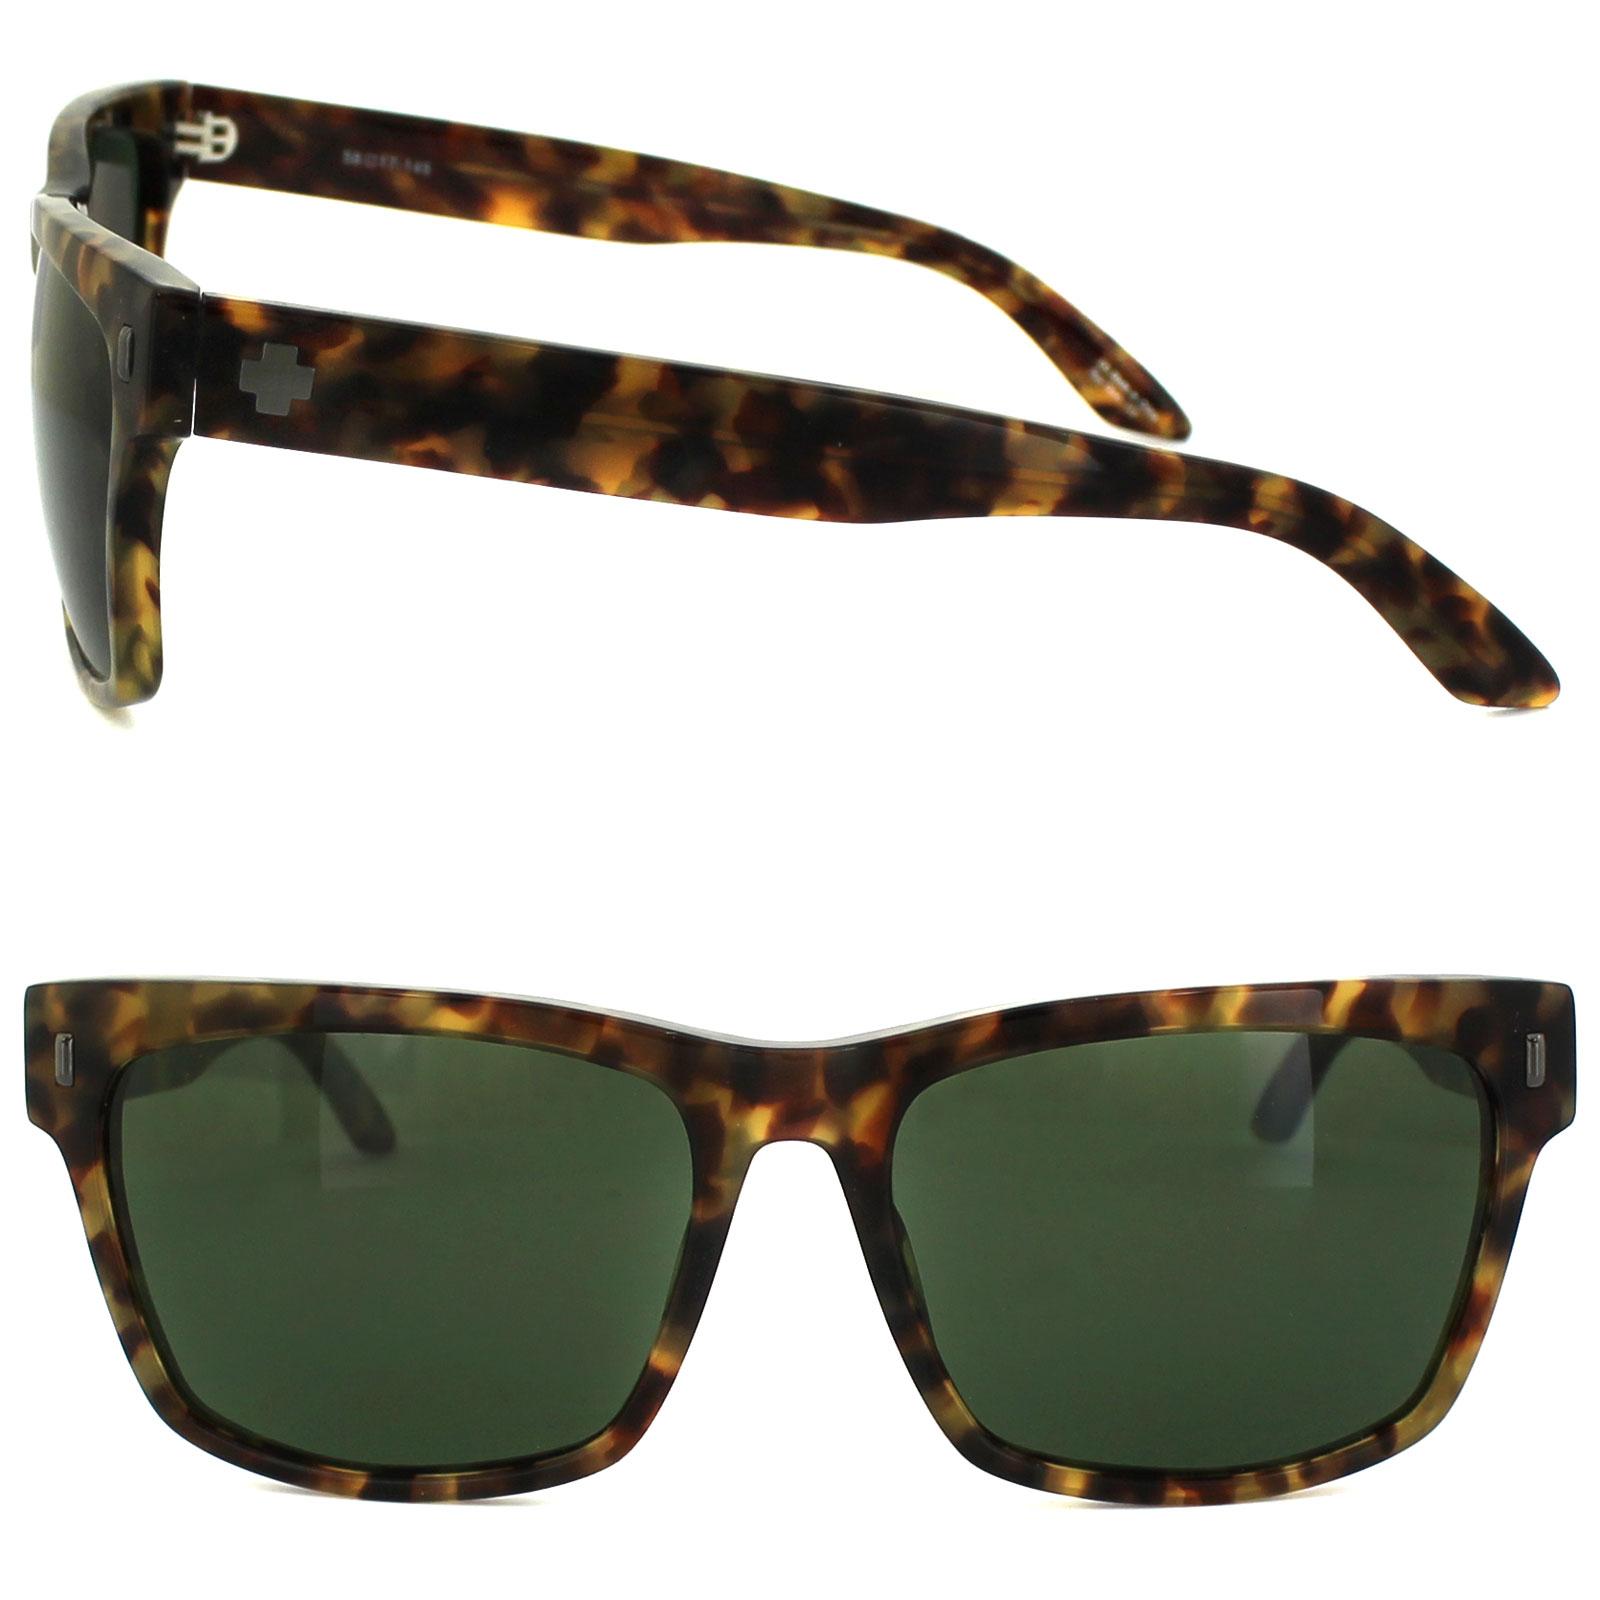 1150a4ccac Spy Haight Sunglasses Thumbnail 1 Spy Haight Sunglasses Thumbnail 2 ...